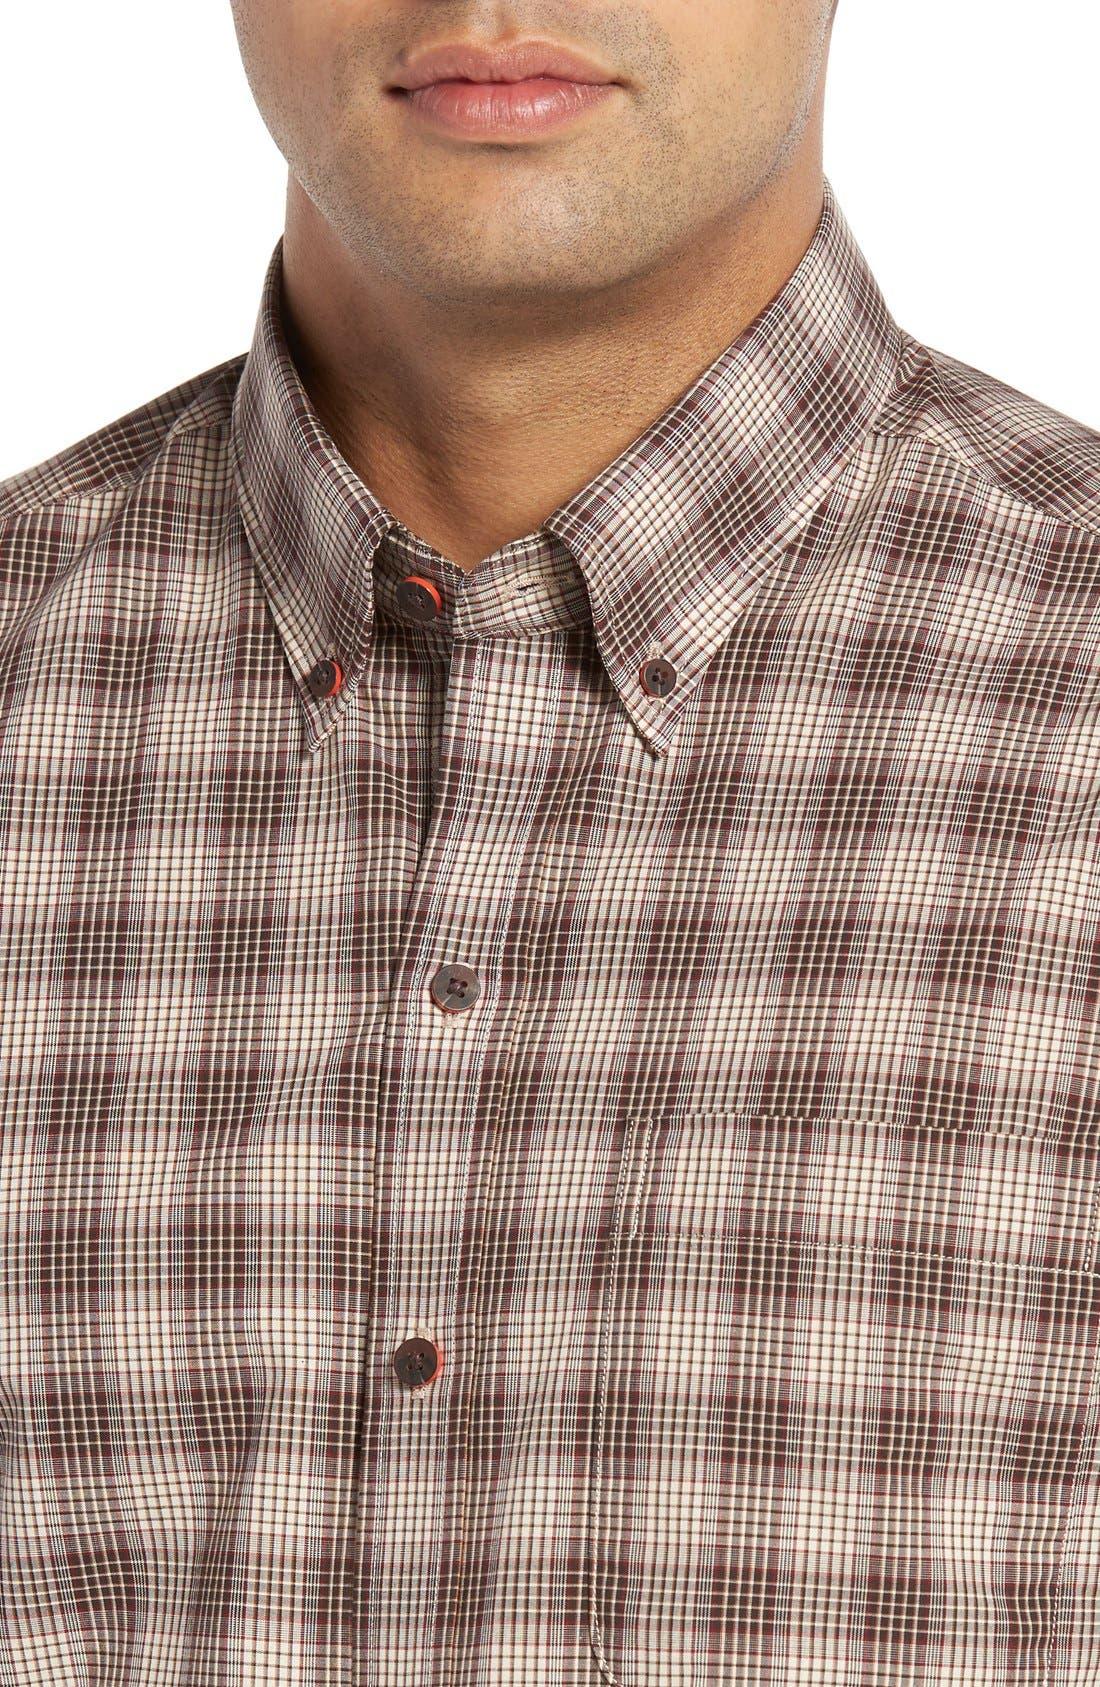 Alternate Image 4  - Cutter & Buck 'Ridge' Plaid Cotton Poplin Sport Shirt (Big & Tall)